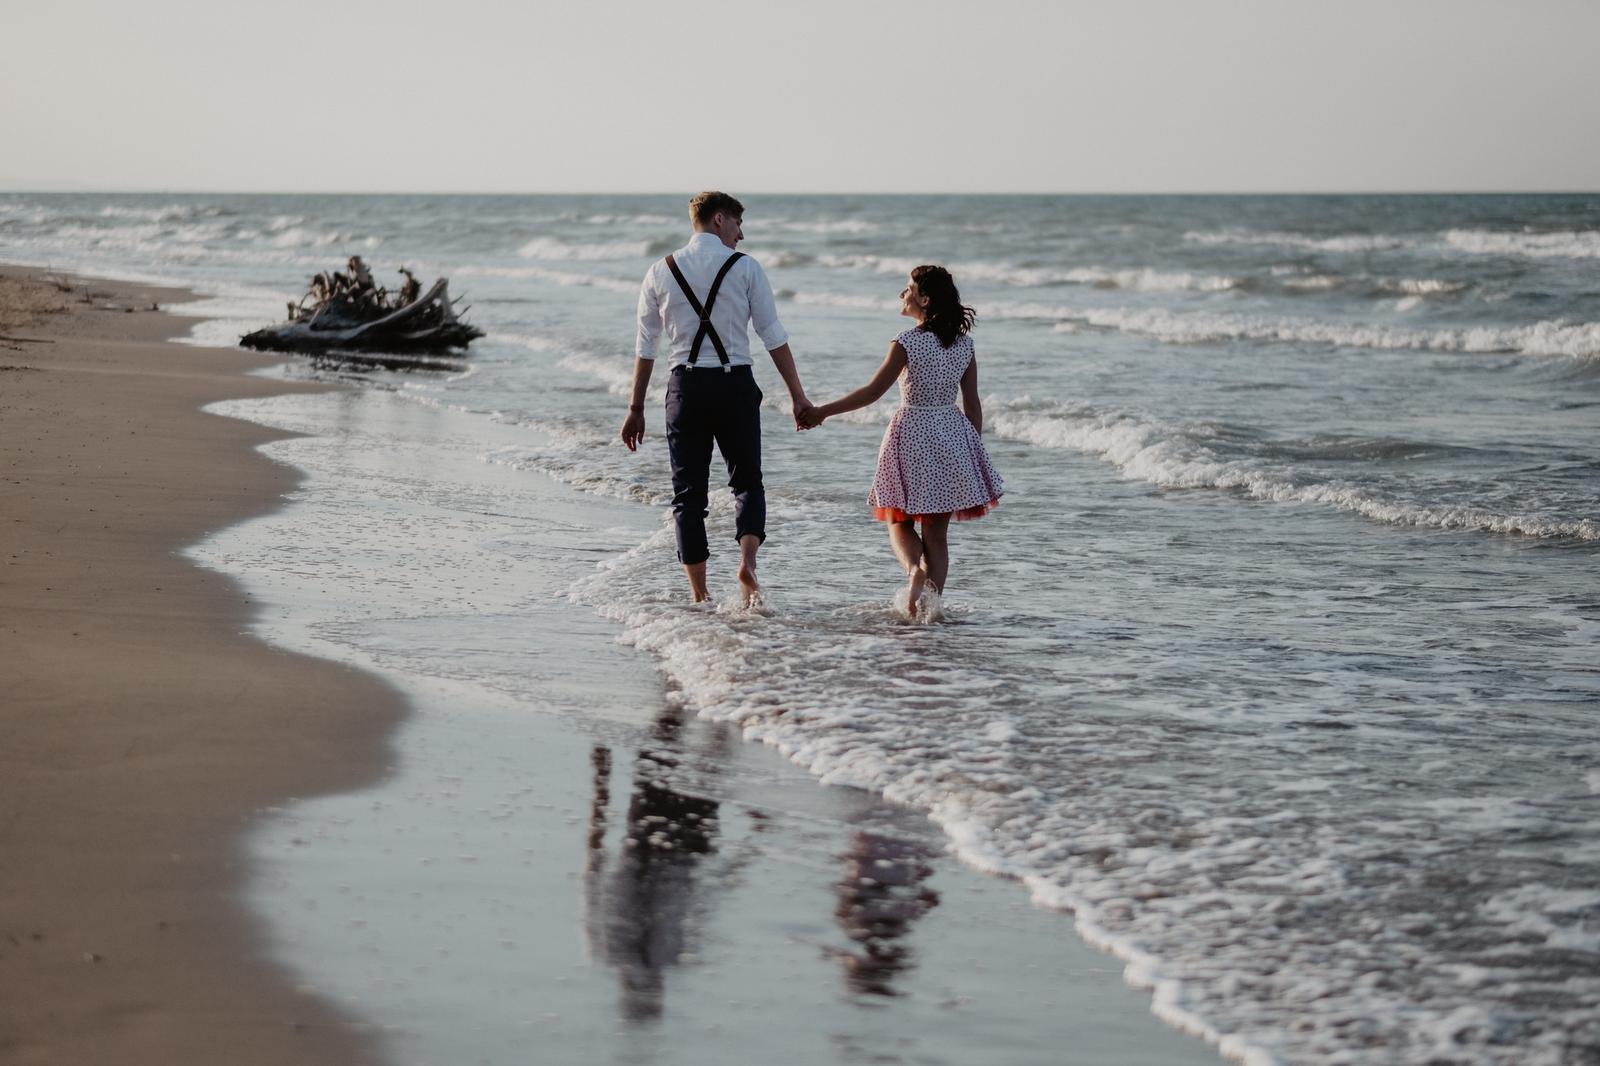 rezetka91 - Svatba Lucie a Petr. Foto by @Khiria - wedding photographer